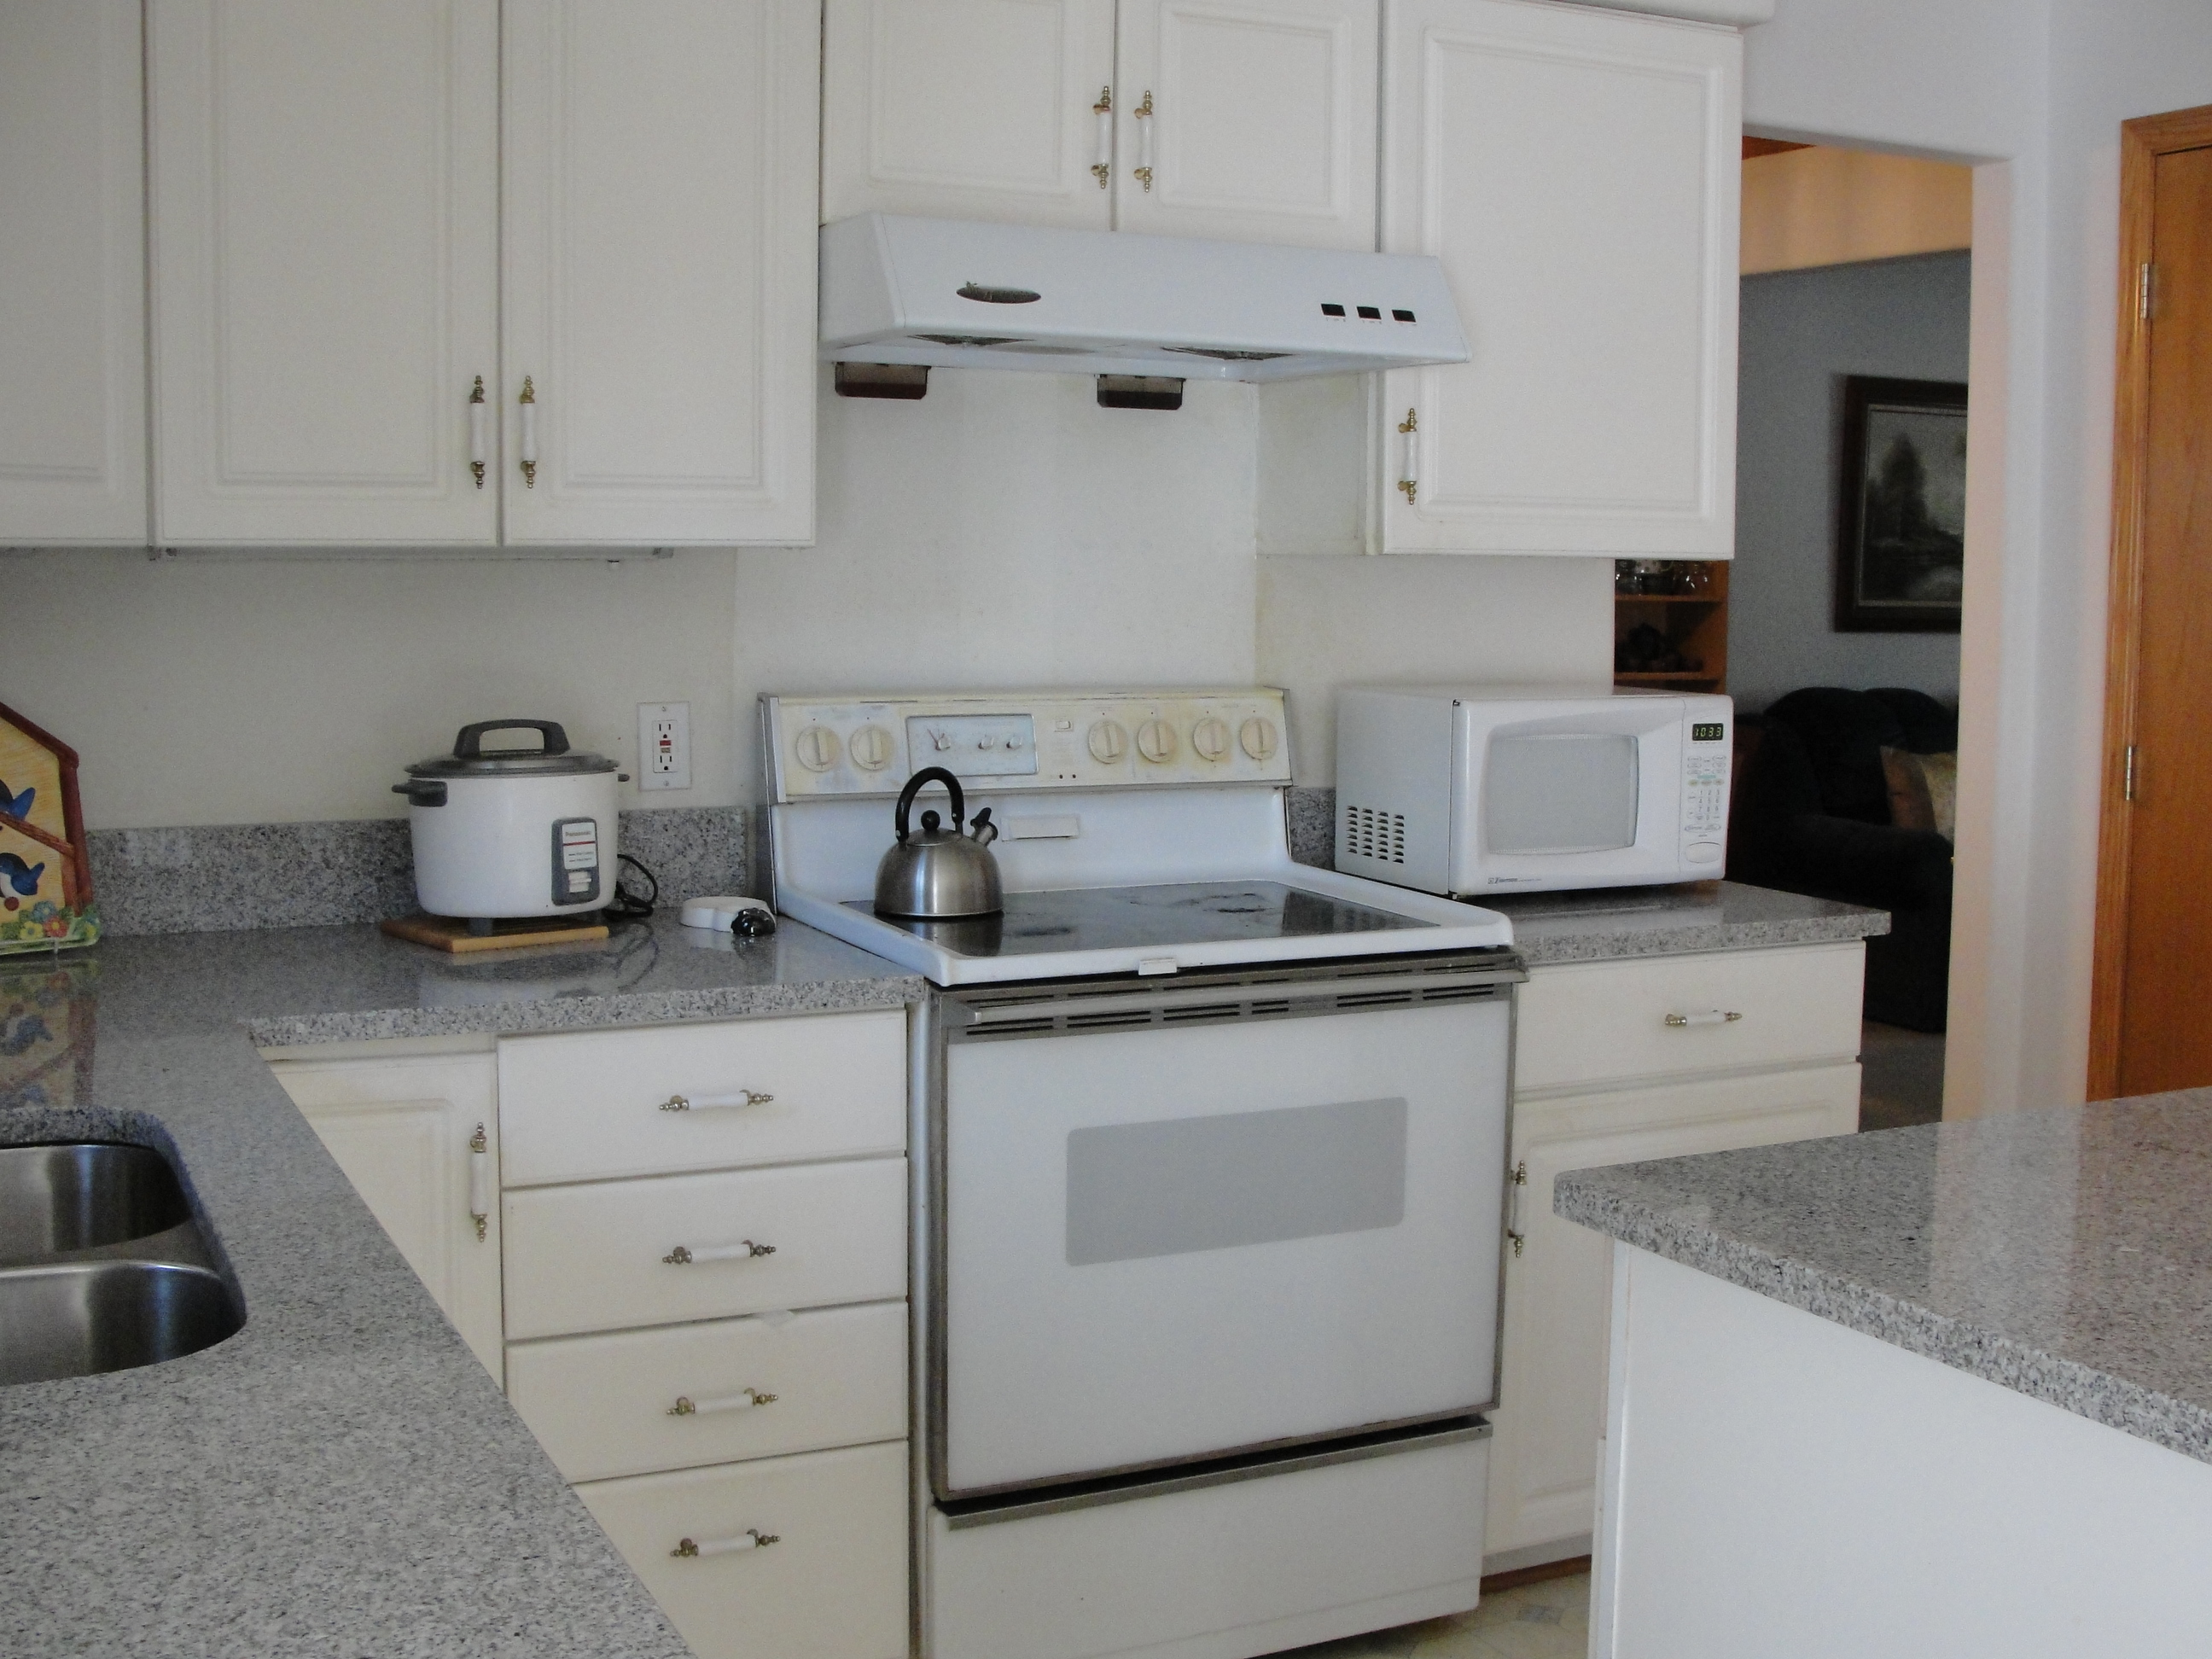 lowes kitchen cabinets home depot tile backsplash 小厨房旧貌换新颜 还在进行时 南方朱槿的网上家园 lowes厨柜